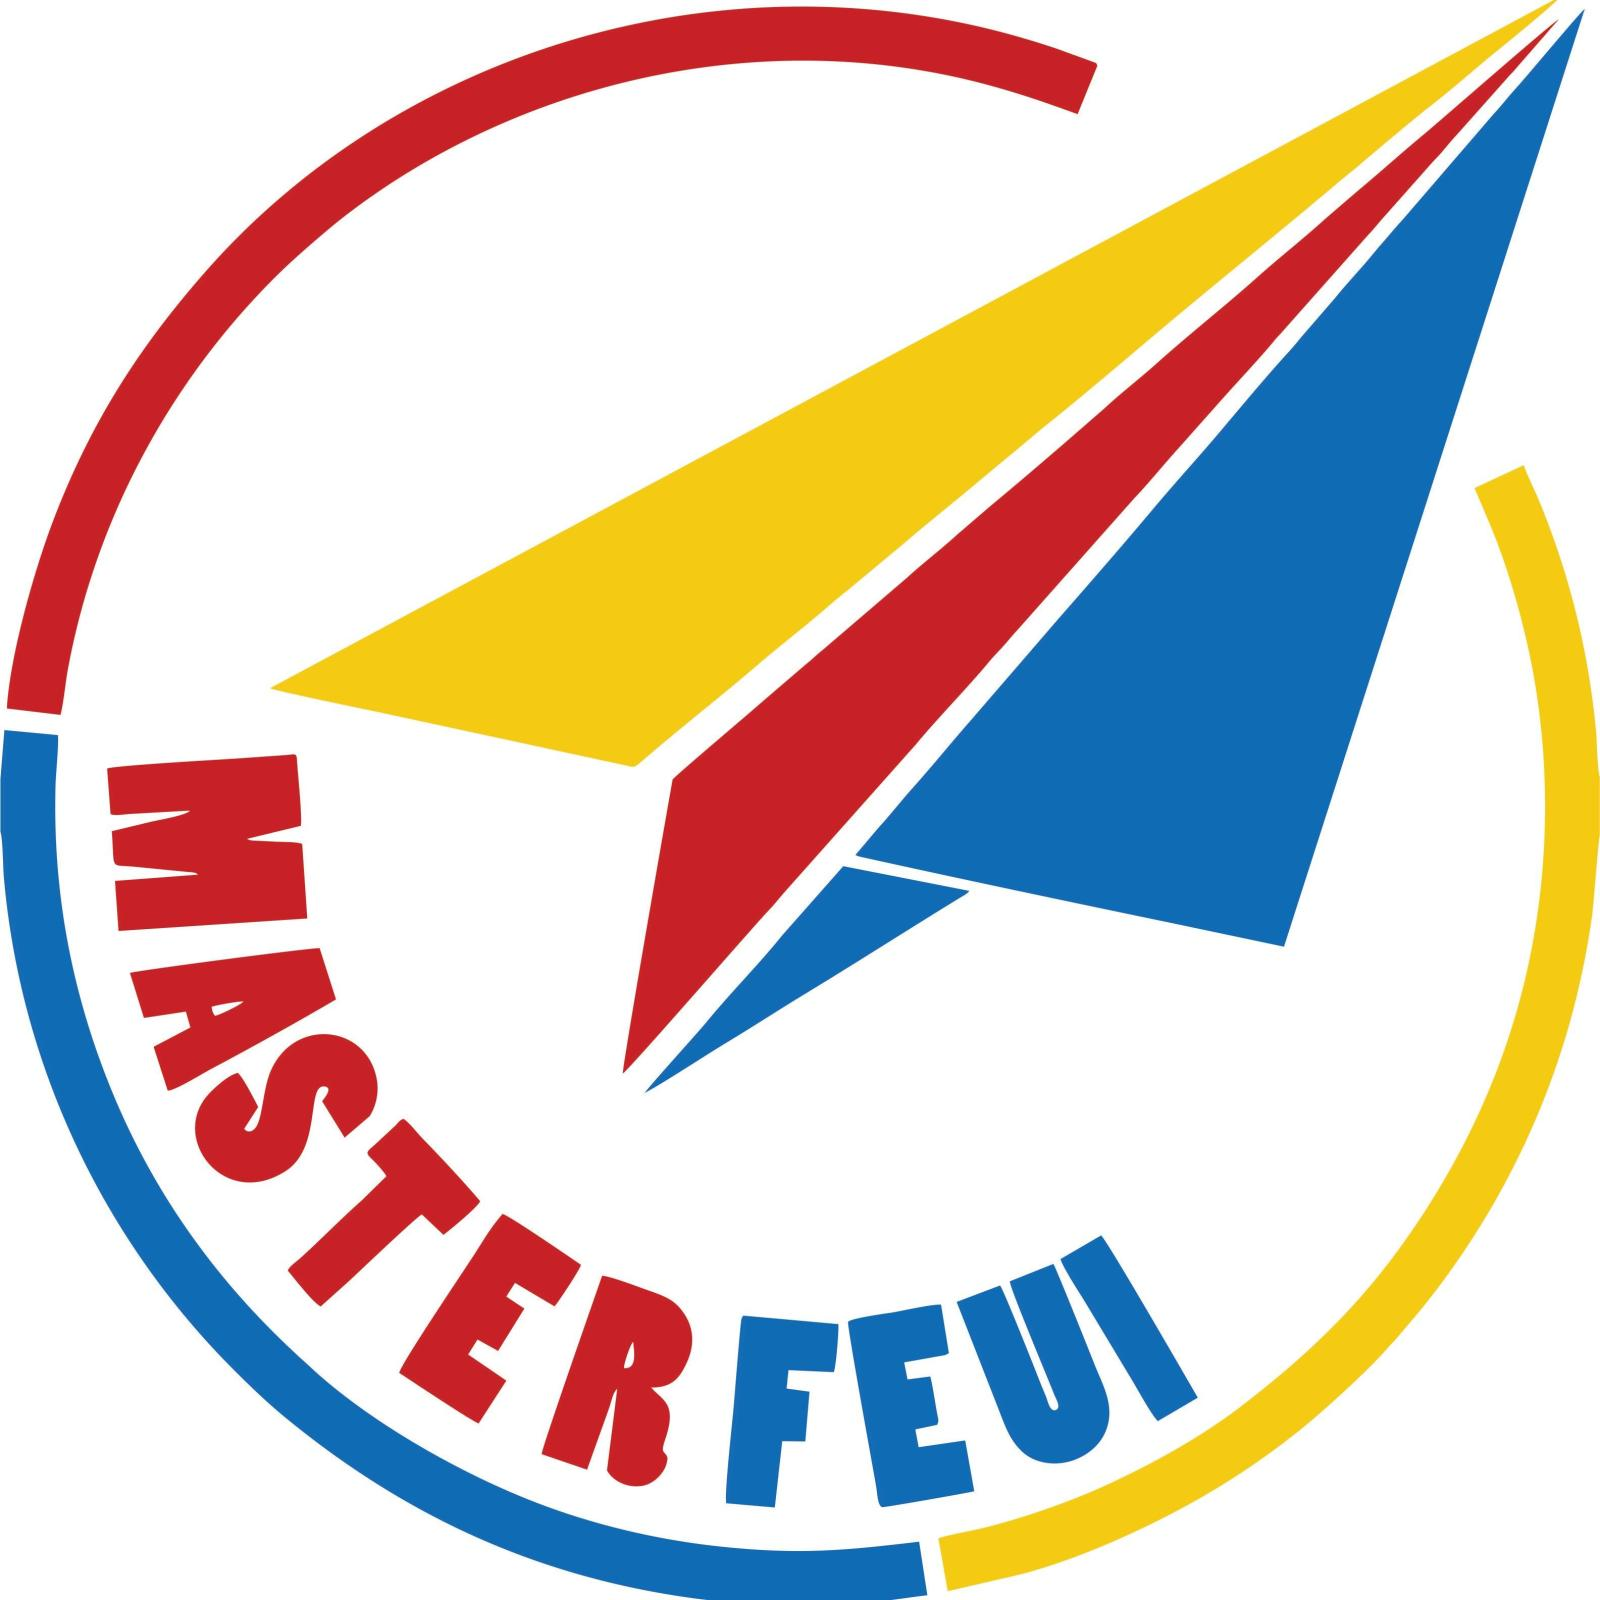 MASTER-FEUI   YABIM DEPOK   SEKOLAH MASTER